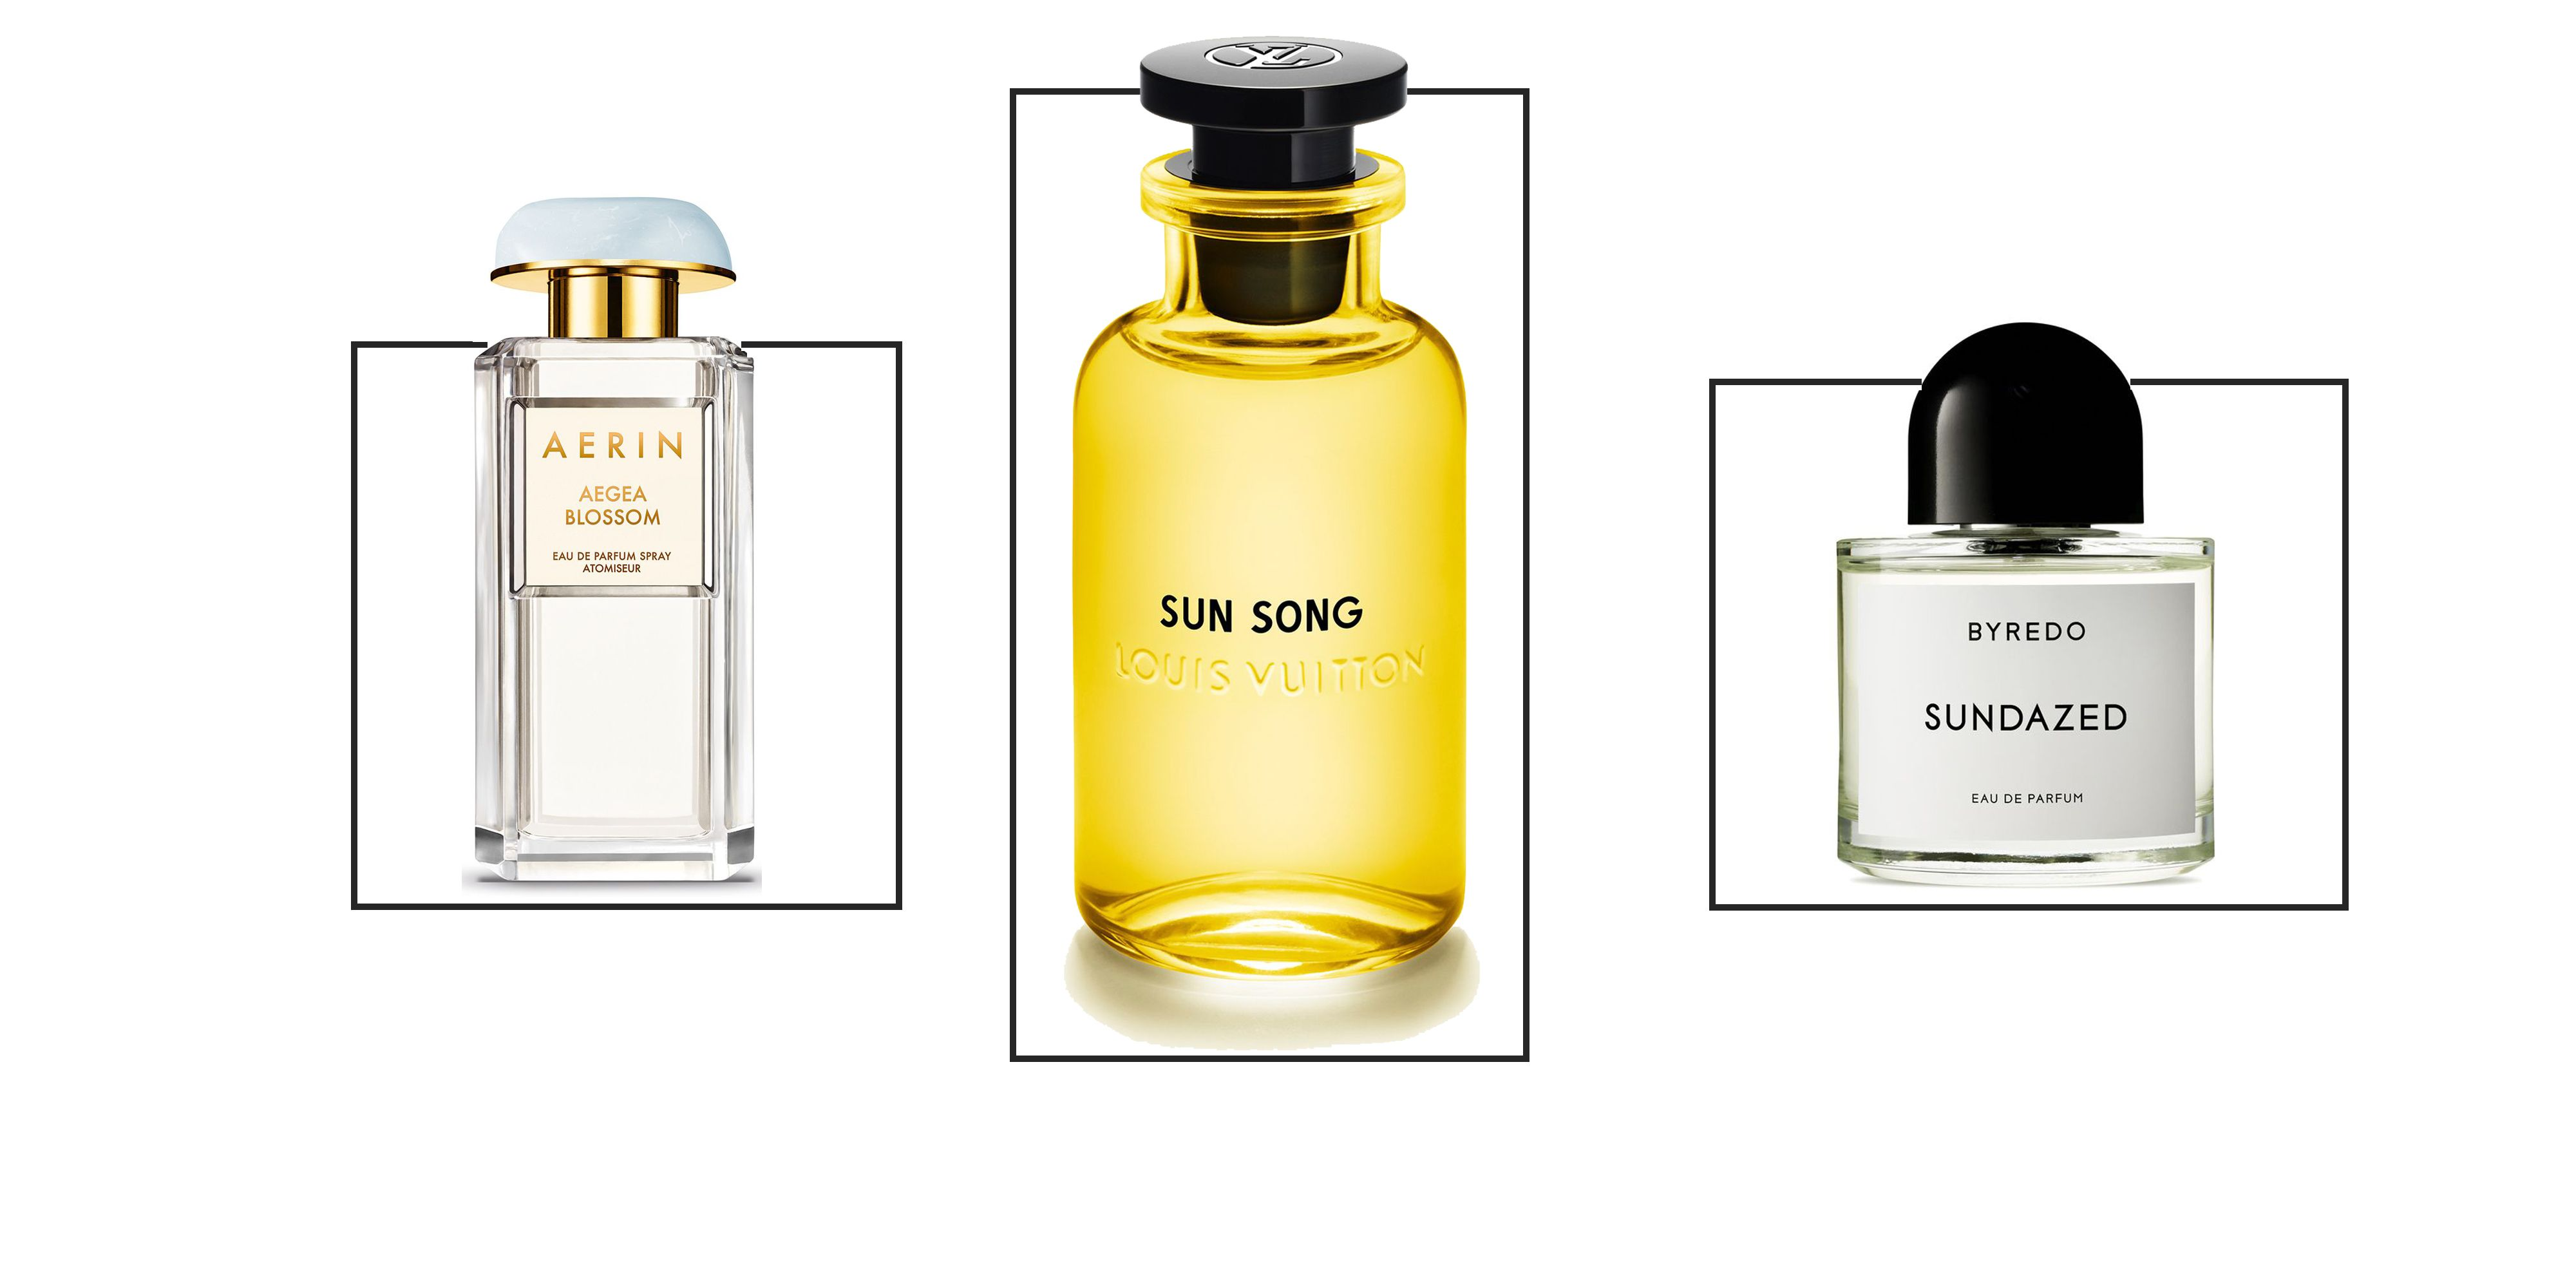 fed51bb0 The best new women's fragrances - Best new female perfumes